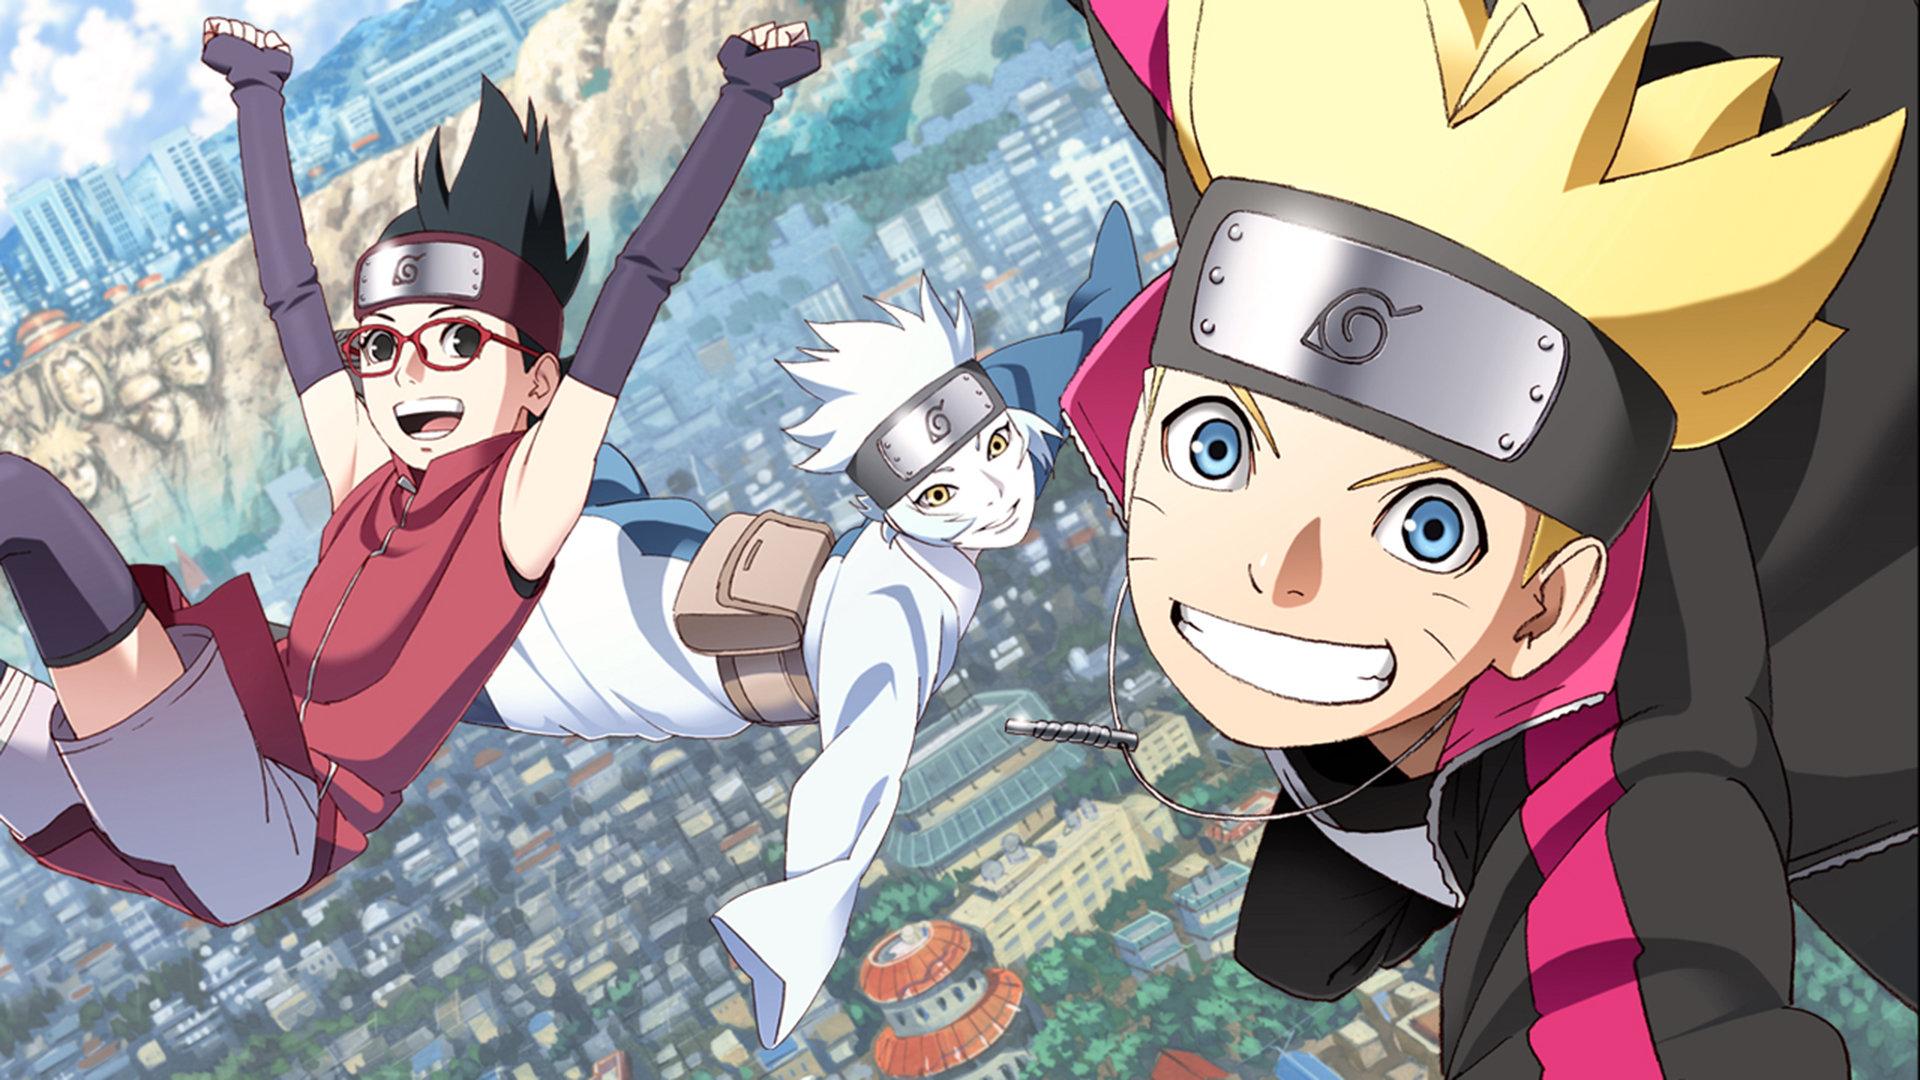 Boruto: Naruto Next Generations (Anime TV 2017 - Now)